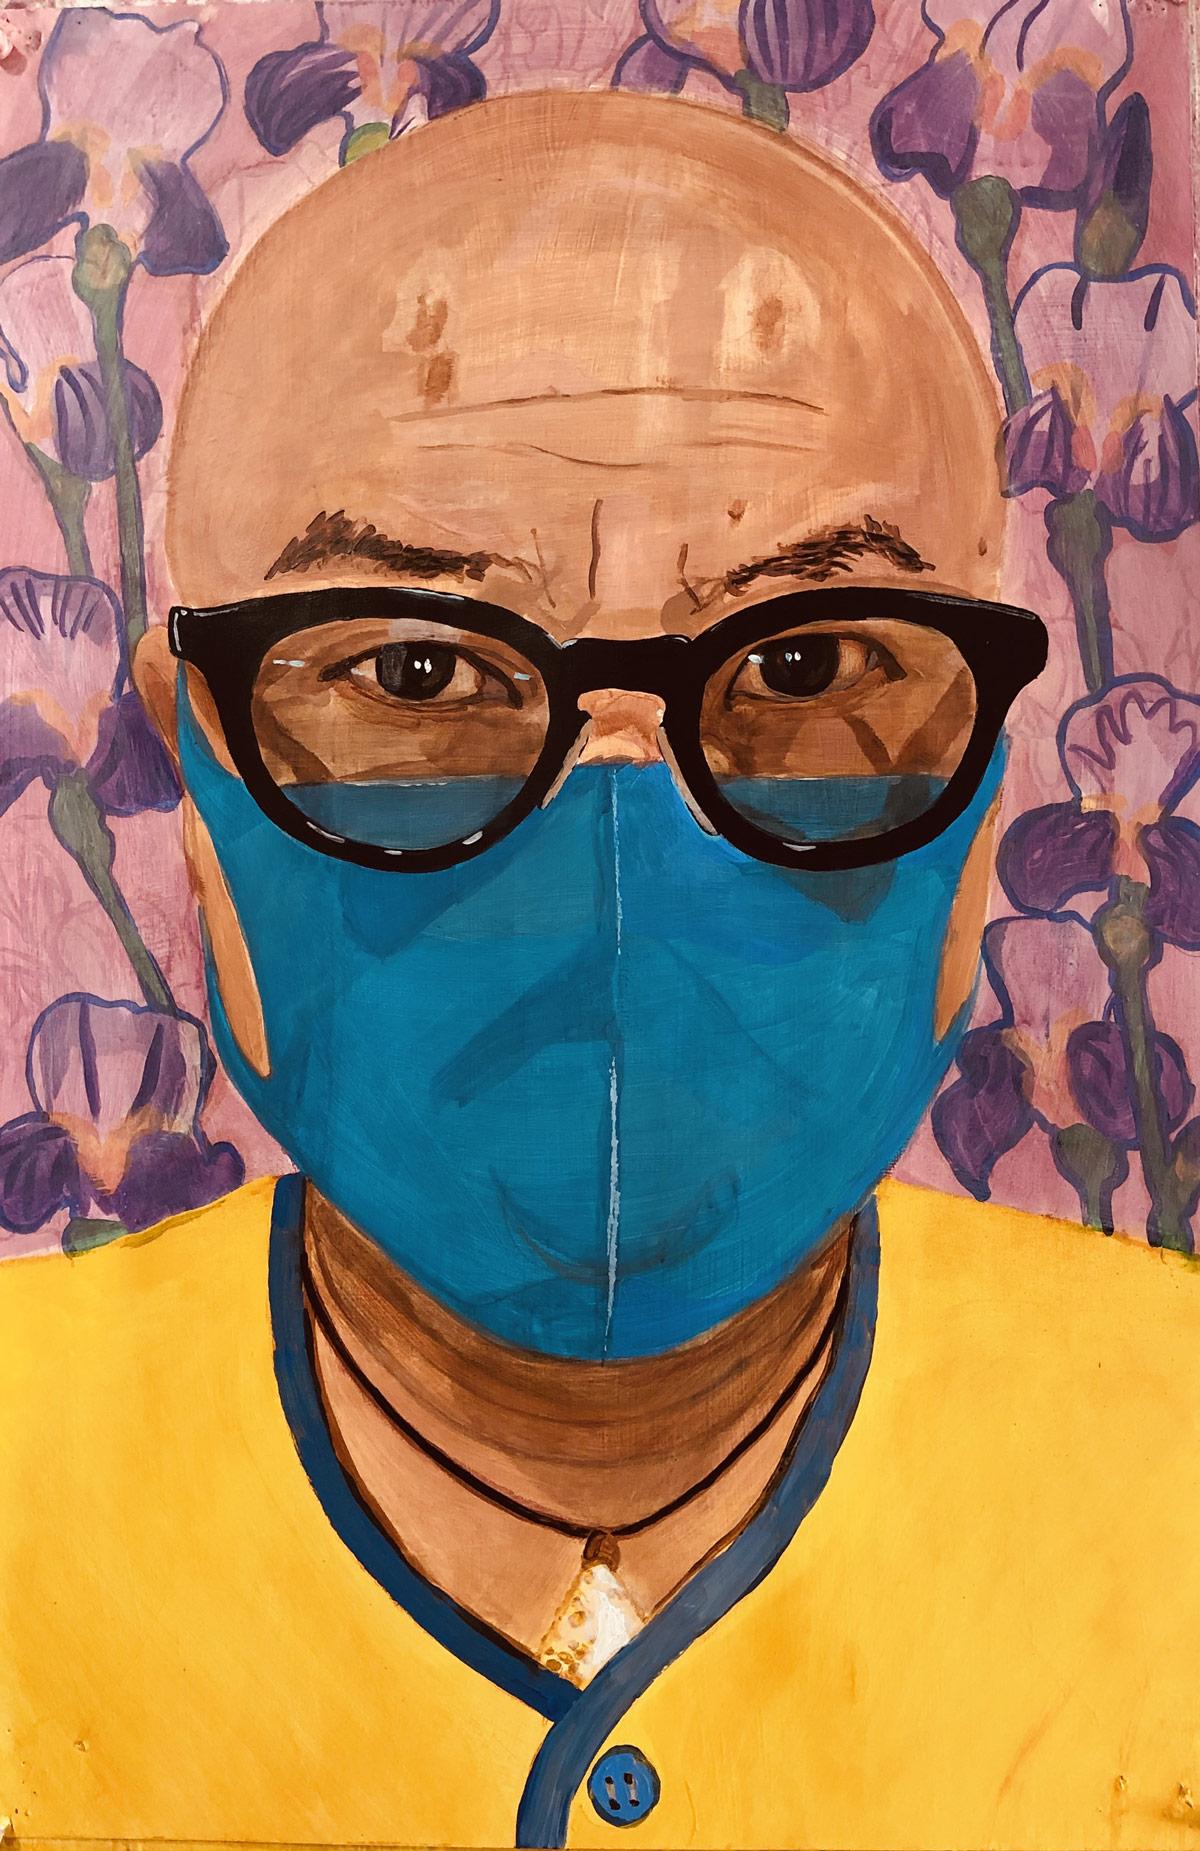 Phong H. Bui, writer/artist Brooklyn Rail. NYC, 2020